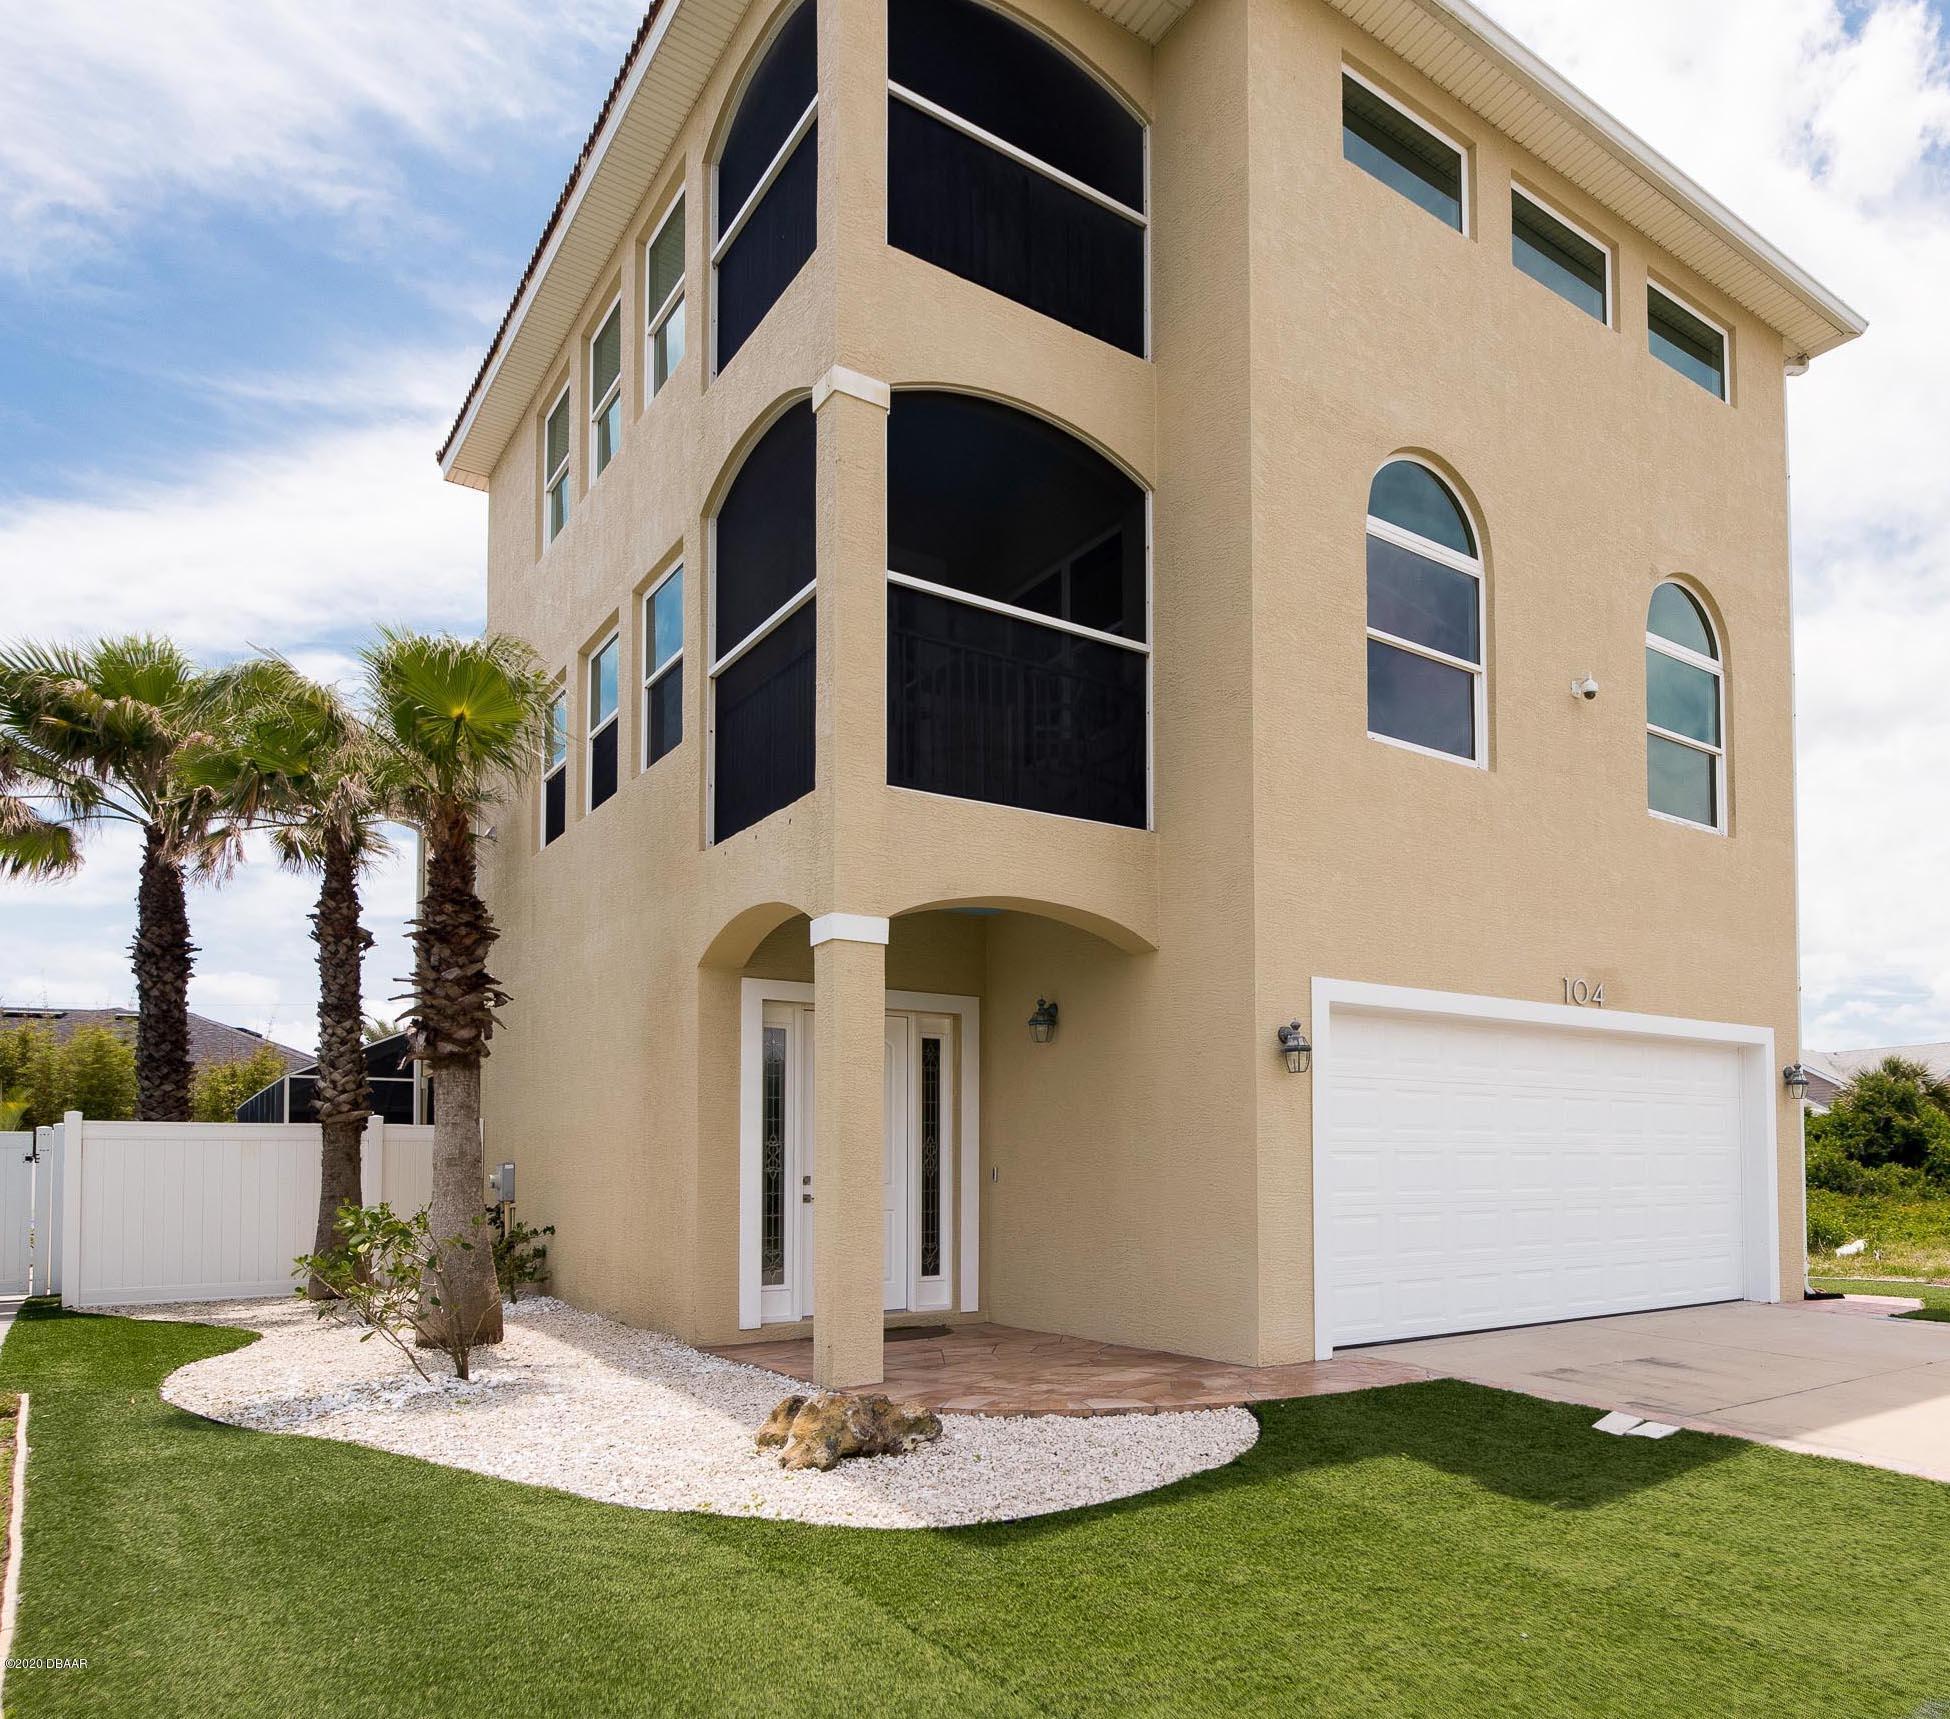 Photo of 104 Via Madrid Drive, Ormond Beach, FL 32176